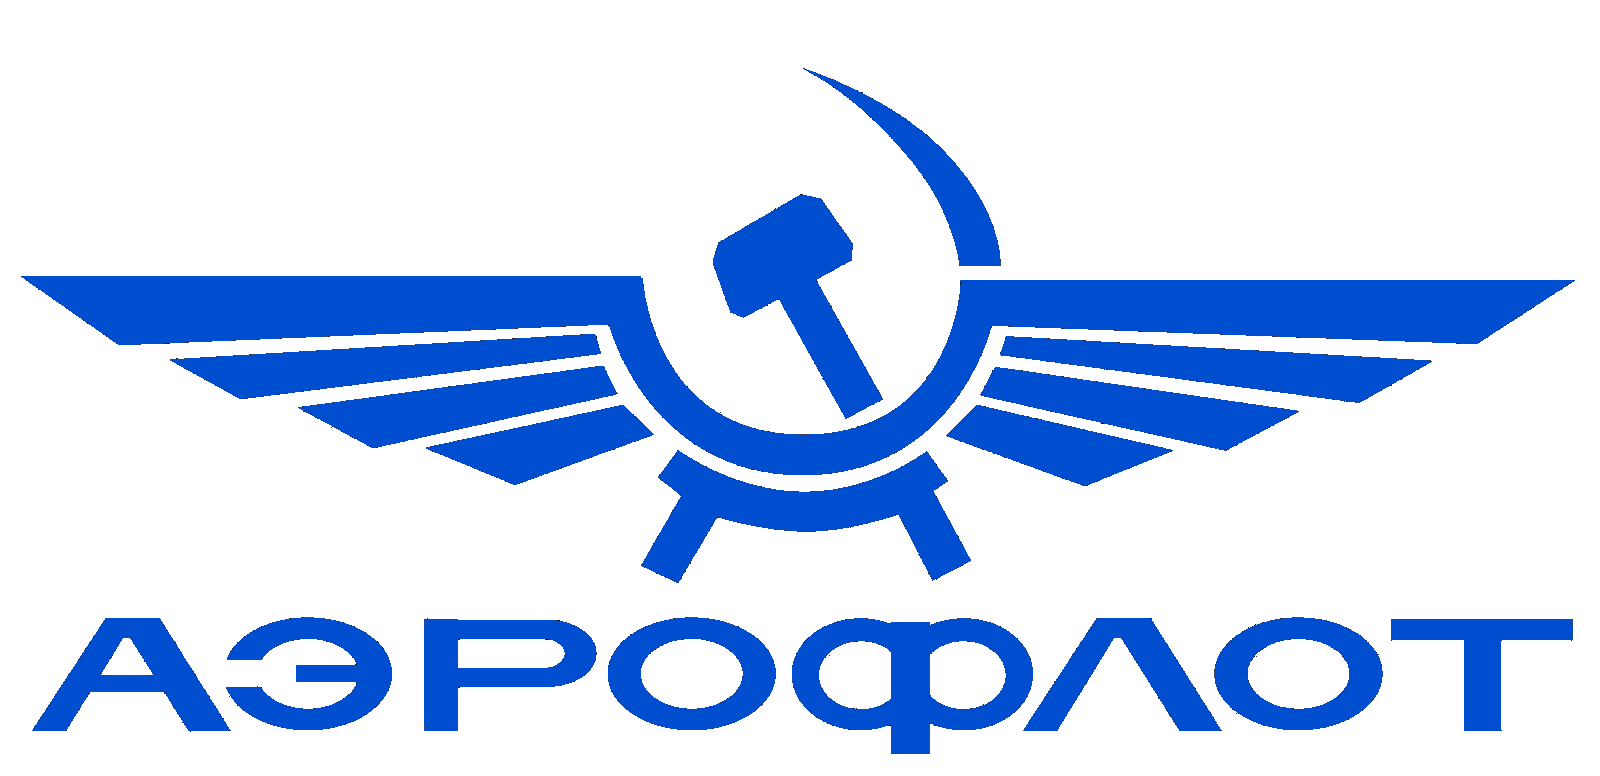 Datei:Aeroflot-Logo-1956.png - Aeroflot Logo PNG